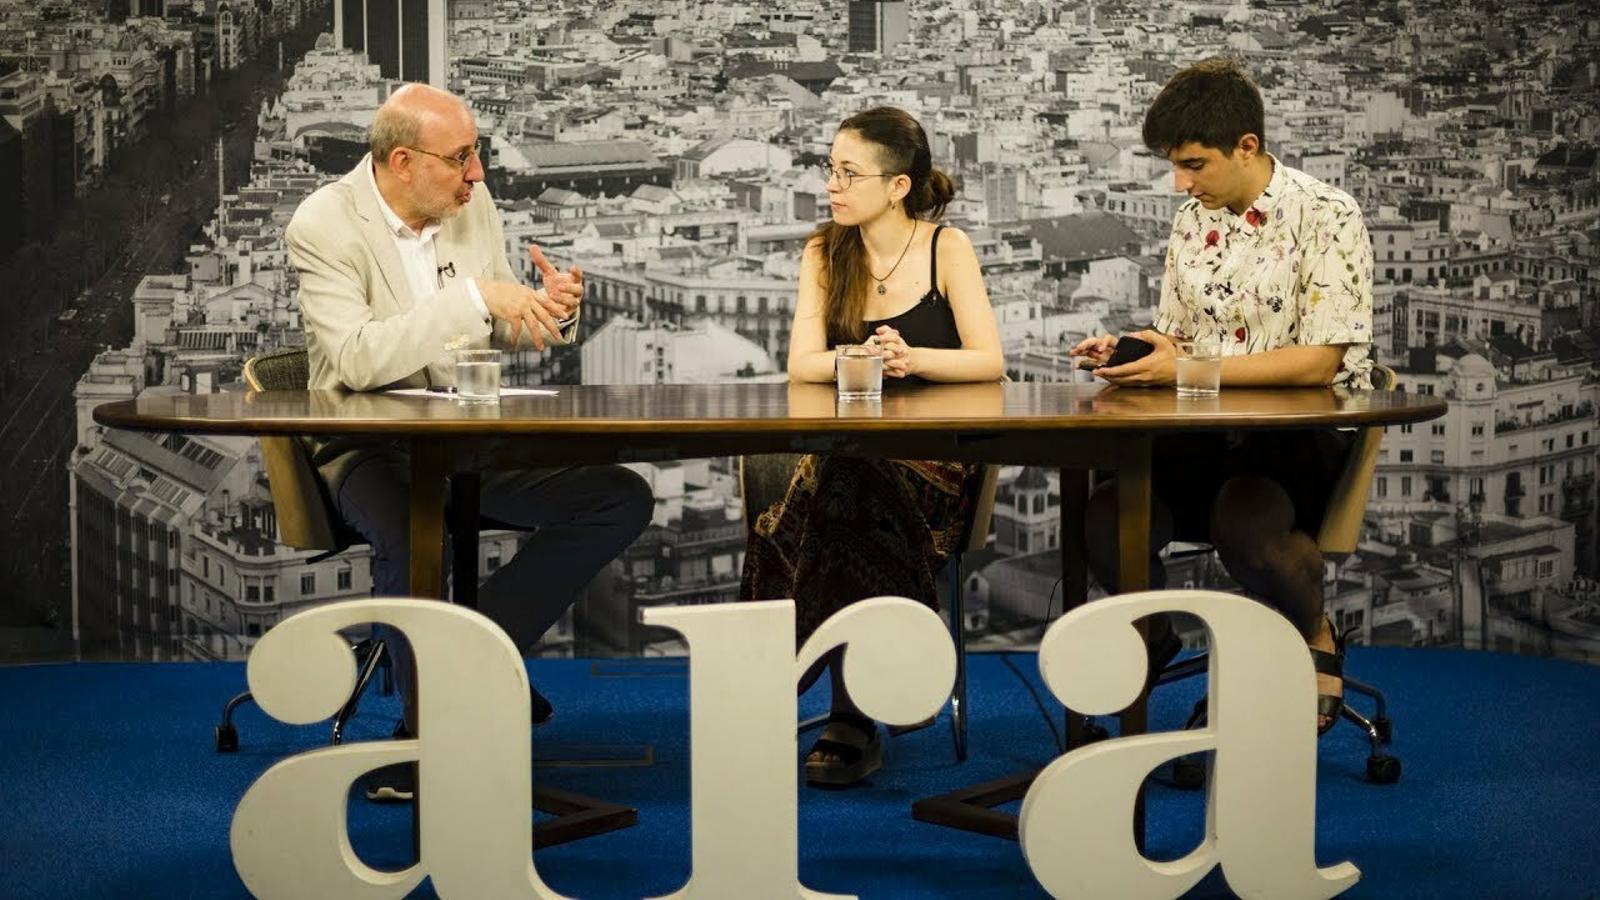 Entrevista d'Antoni Bassas a Gemma Barricarte i Guillermo Chirino